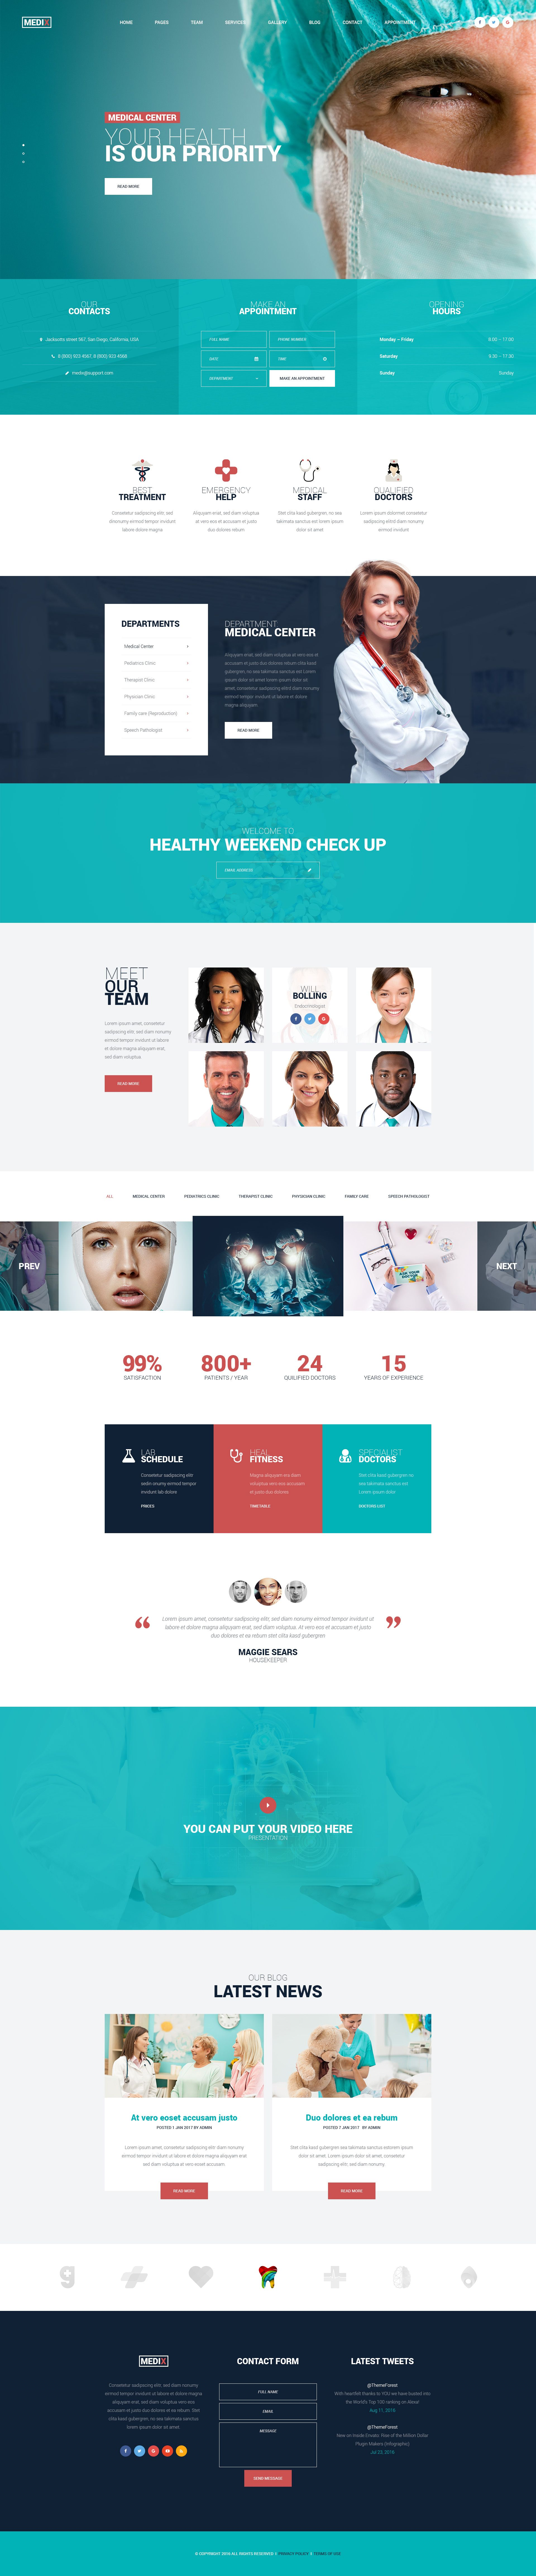 Medix - Medical Clinic PSD Template | Centro médico, Pagina web y ...